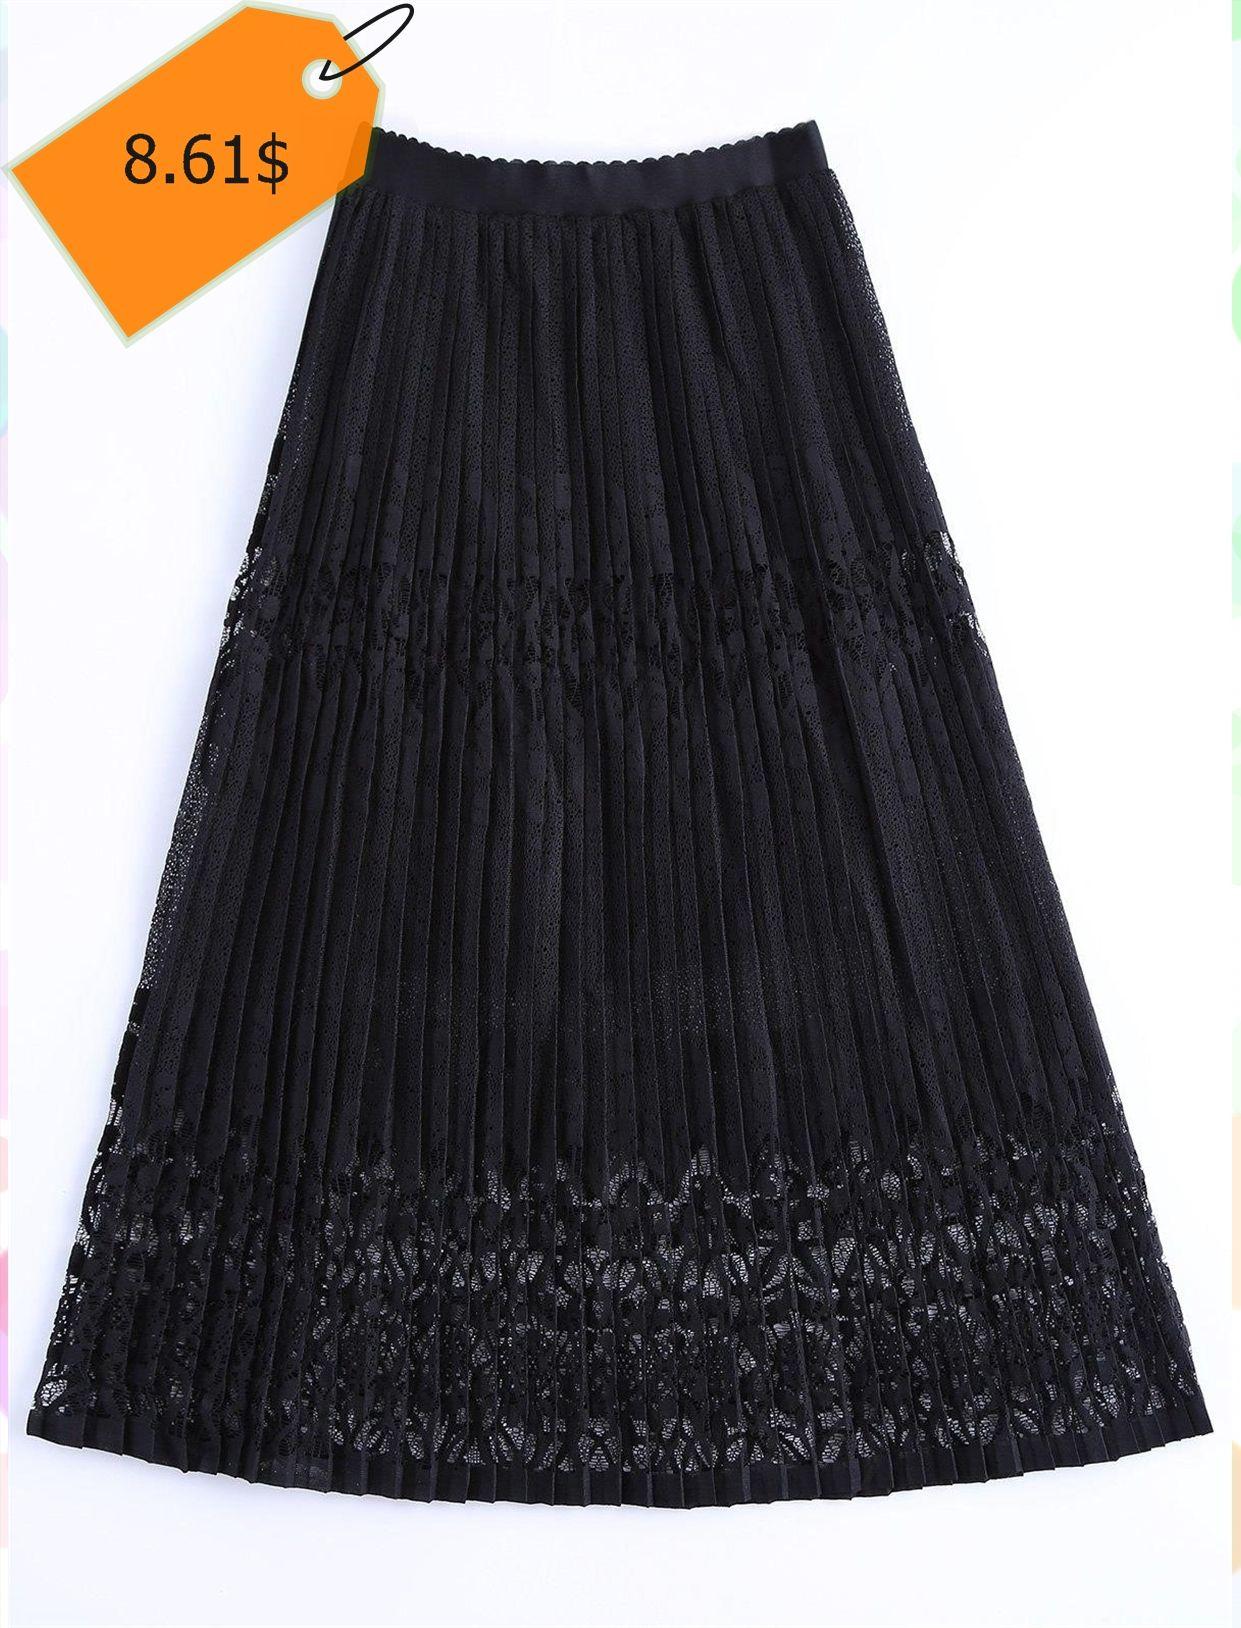 Stylish high waist lace overlay pleated skirt for women classy